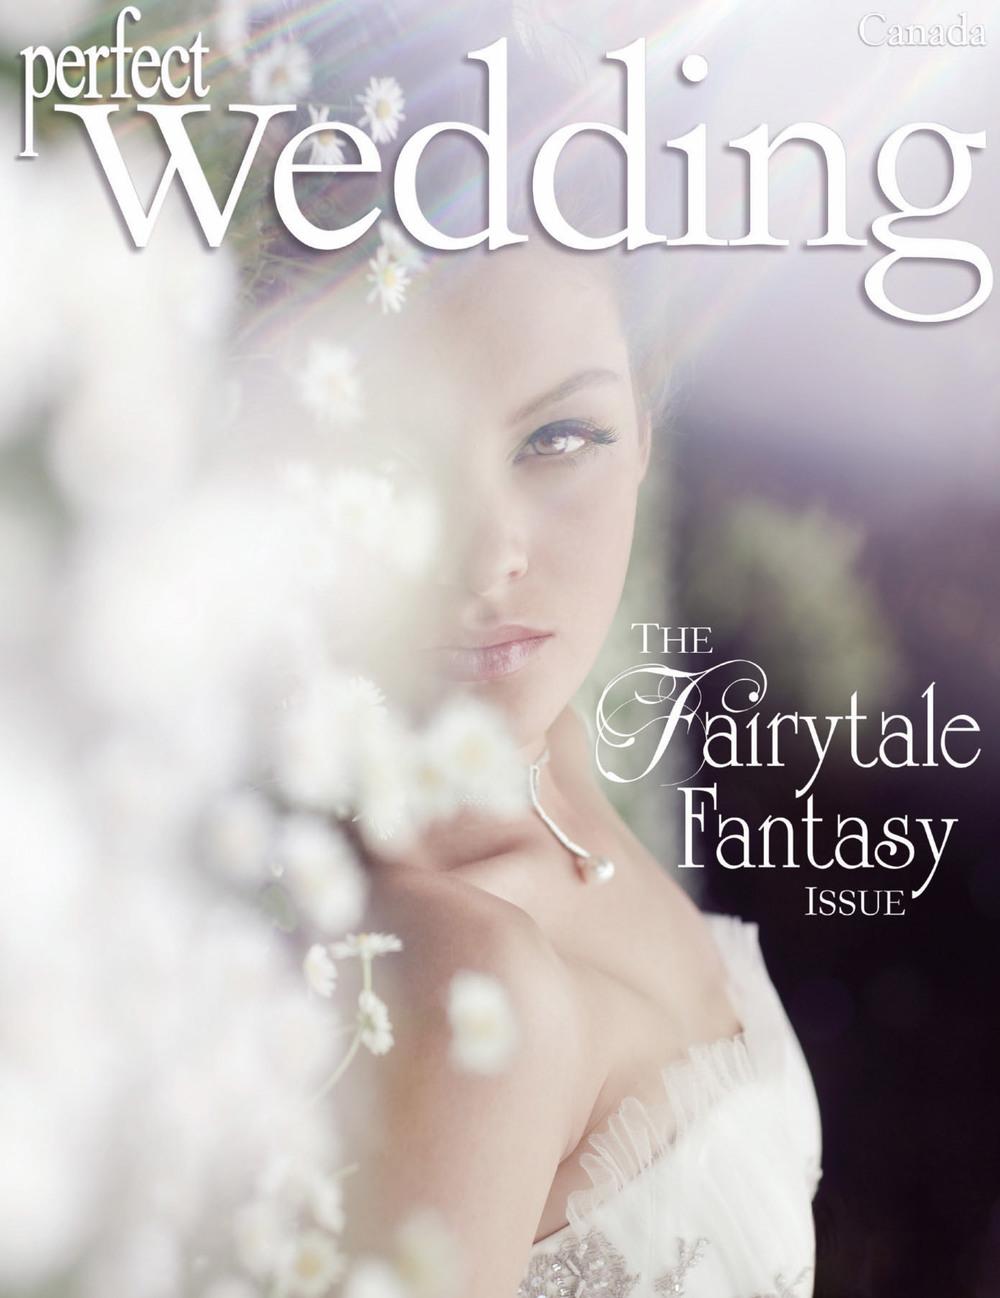 LeannePedersenPhotographers_PerfectWeddingMagazine_FashionEditorial_Cover.jpg